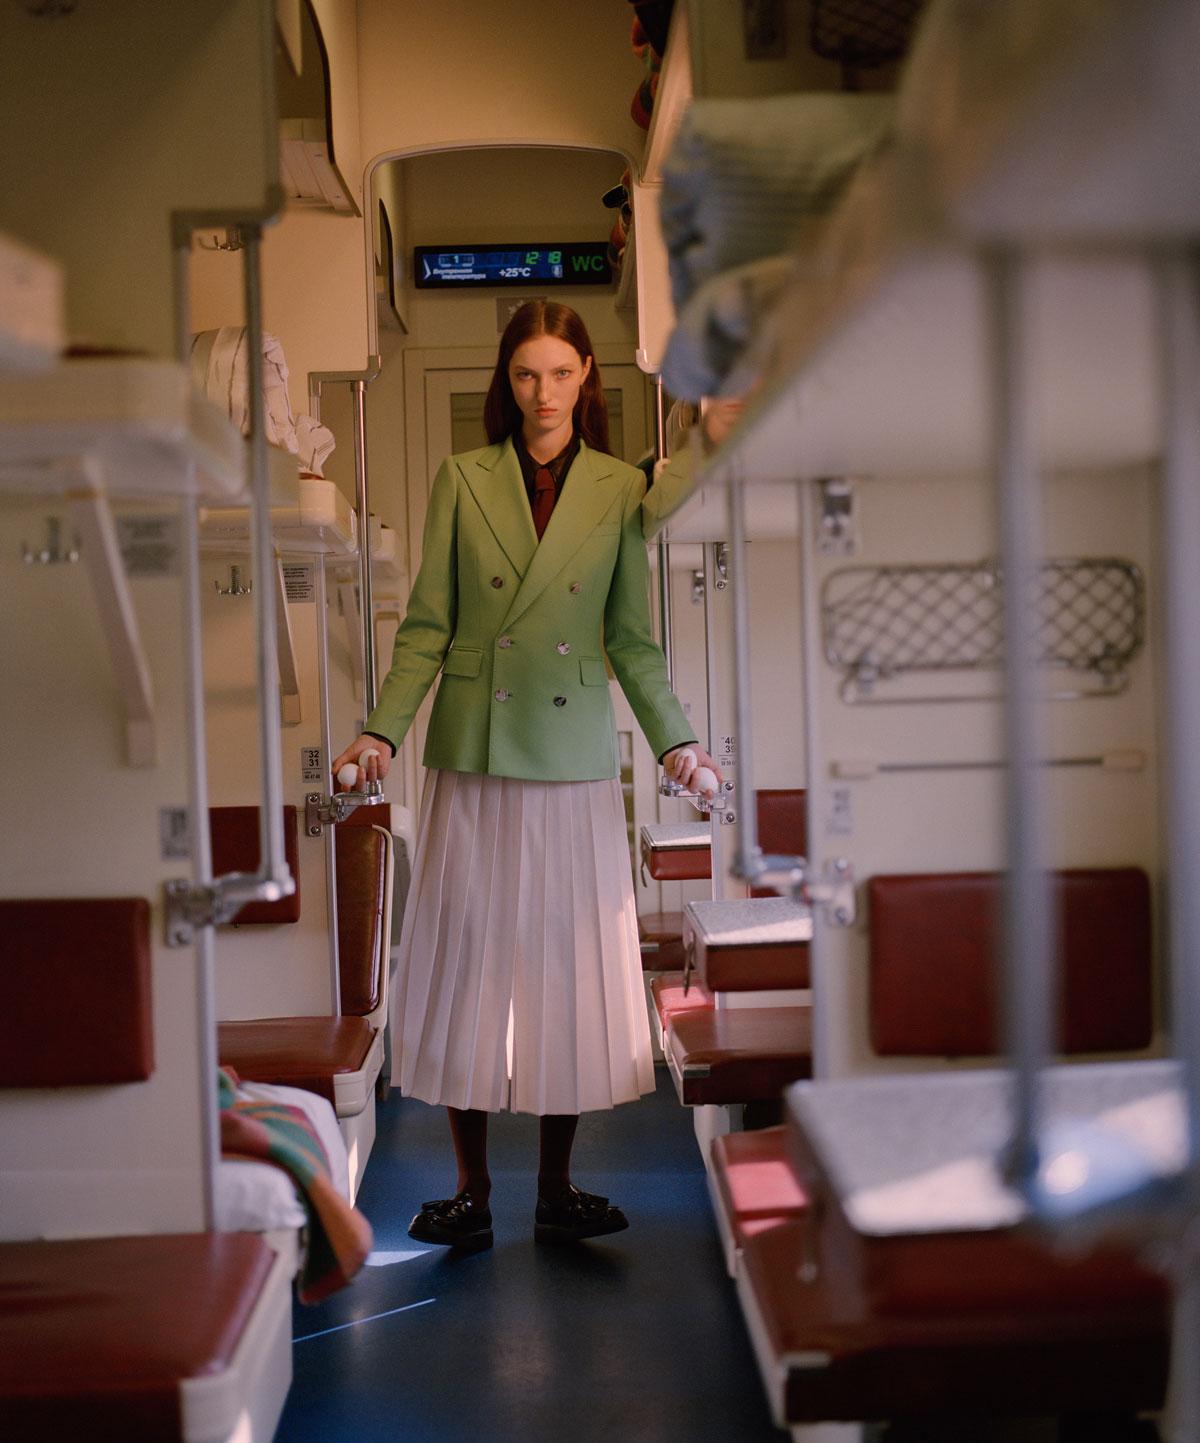 Elle Russia November 2020 在火车上的时尚大片 时尚图库 第9张